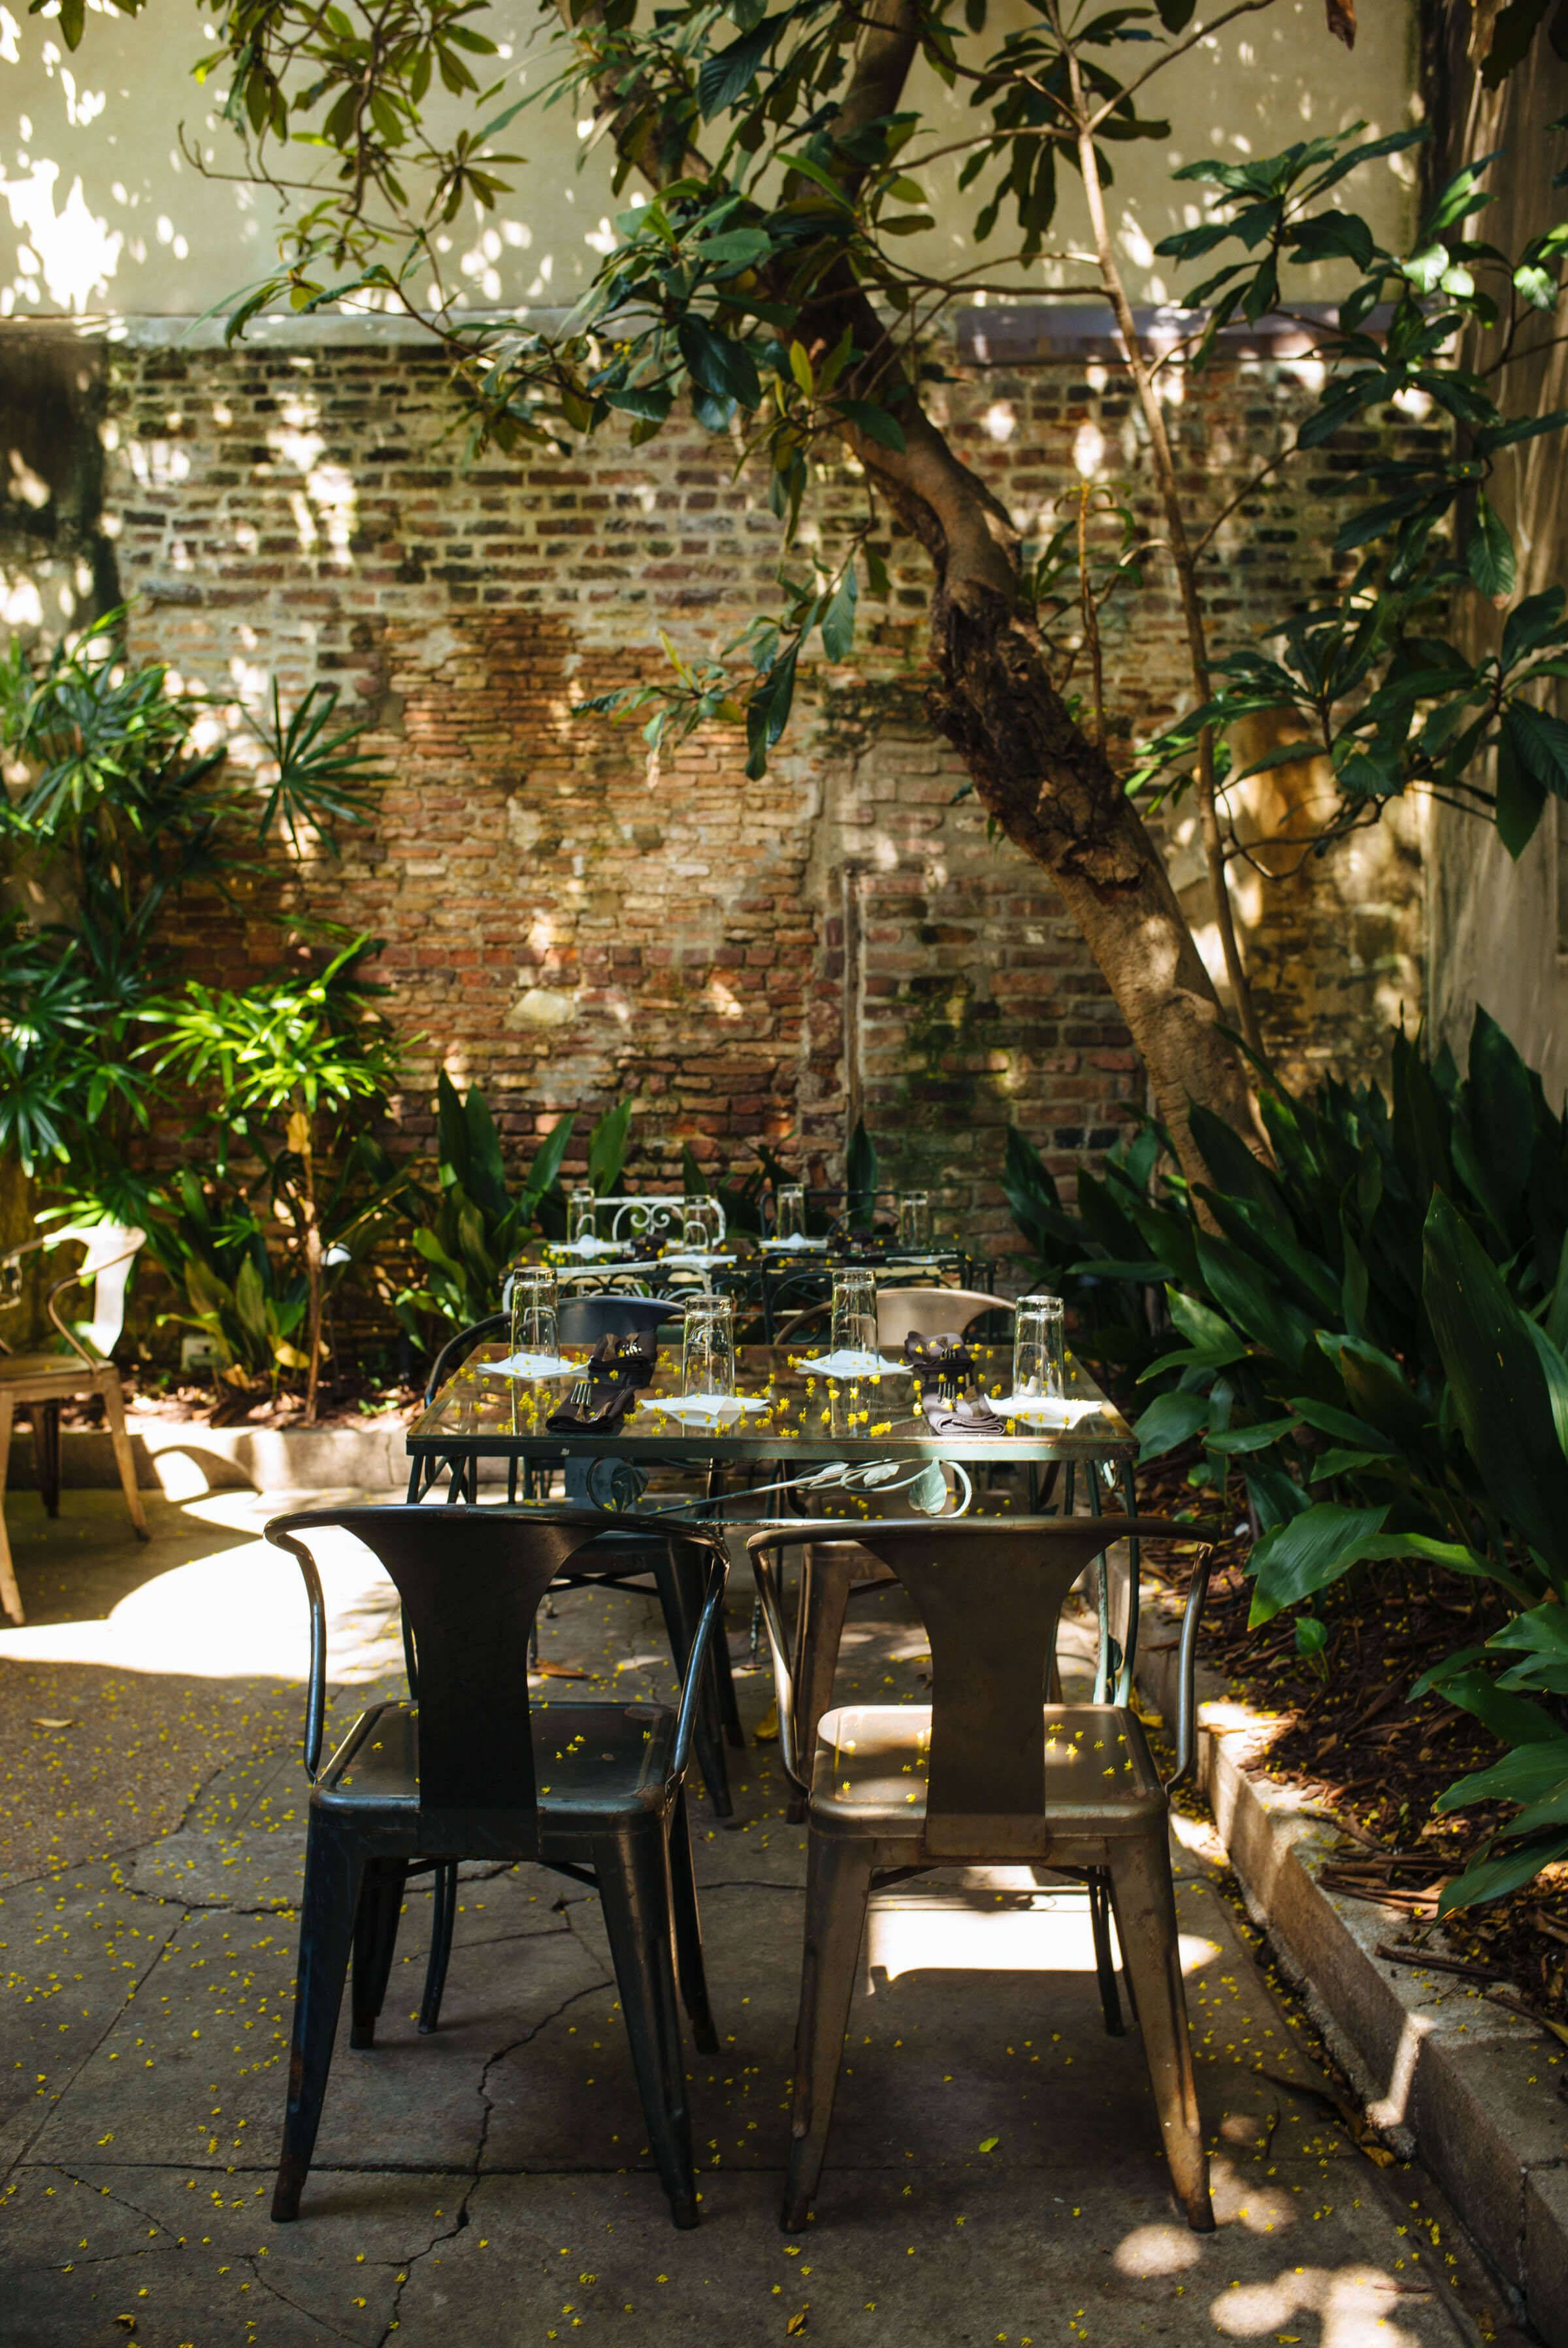 Slyvain The Taste Edit Outdoor Restaurant Patio Outdoor Restaurant Restaurant Patio